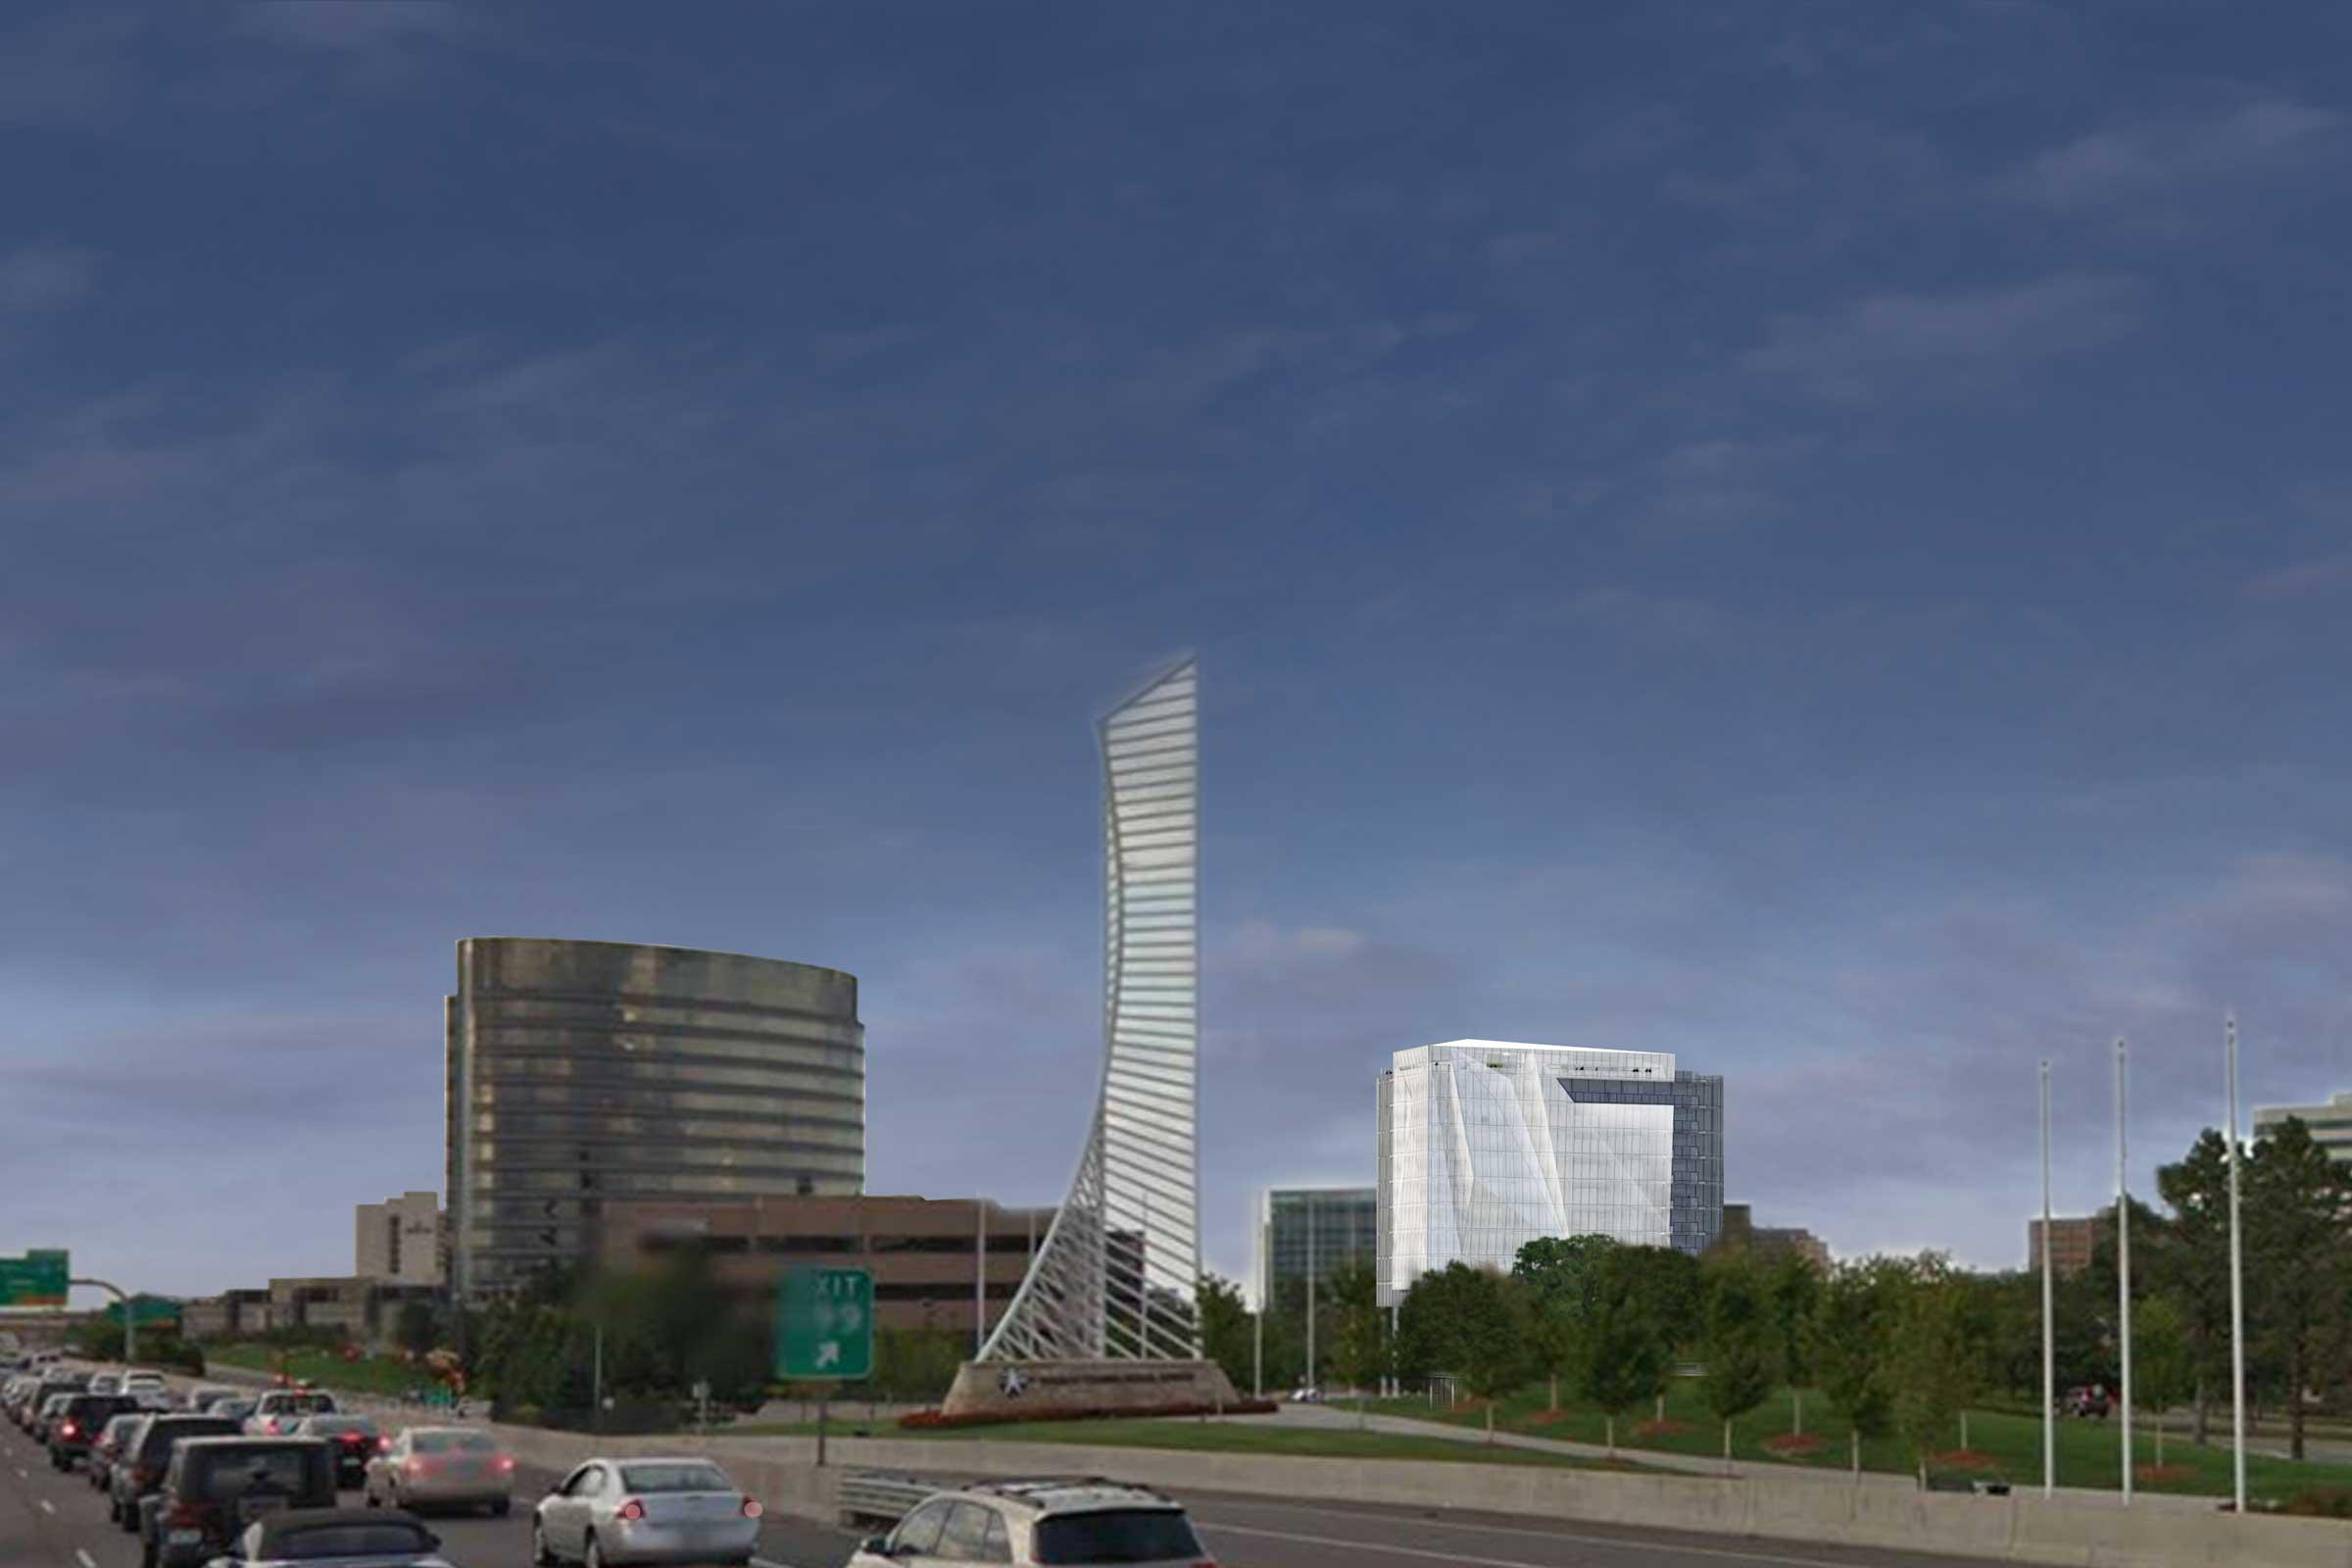 DTC Tower